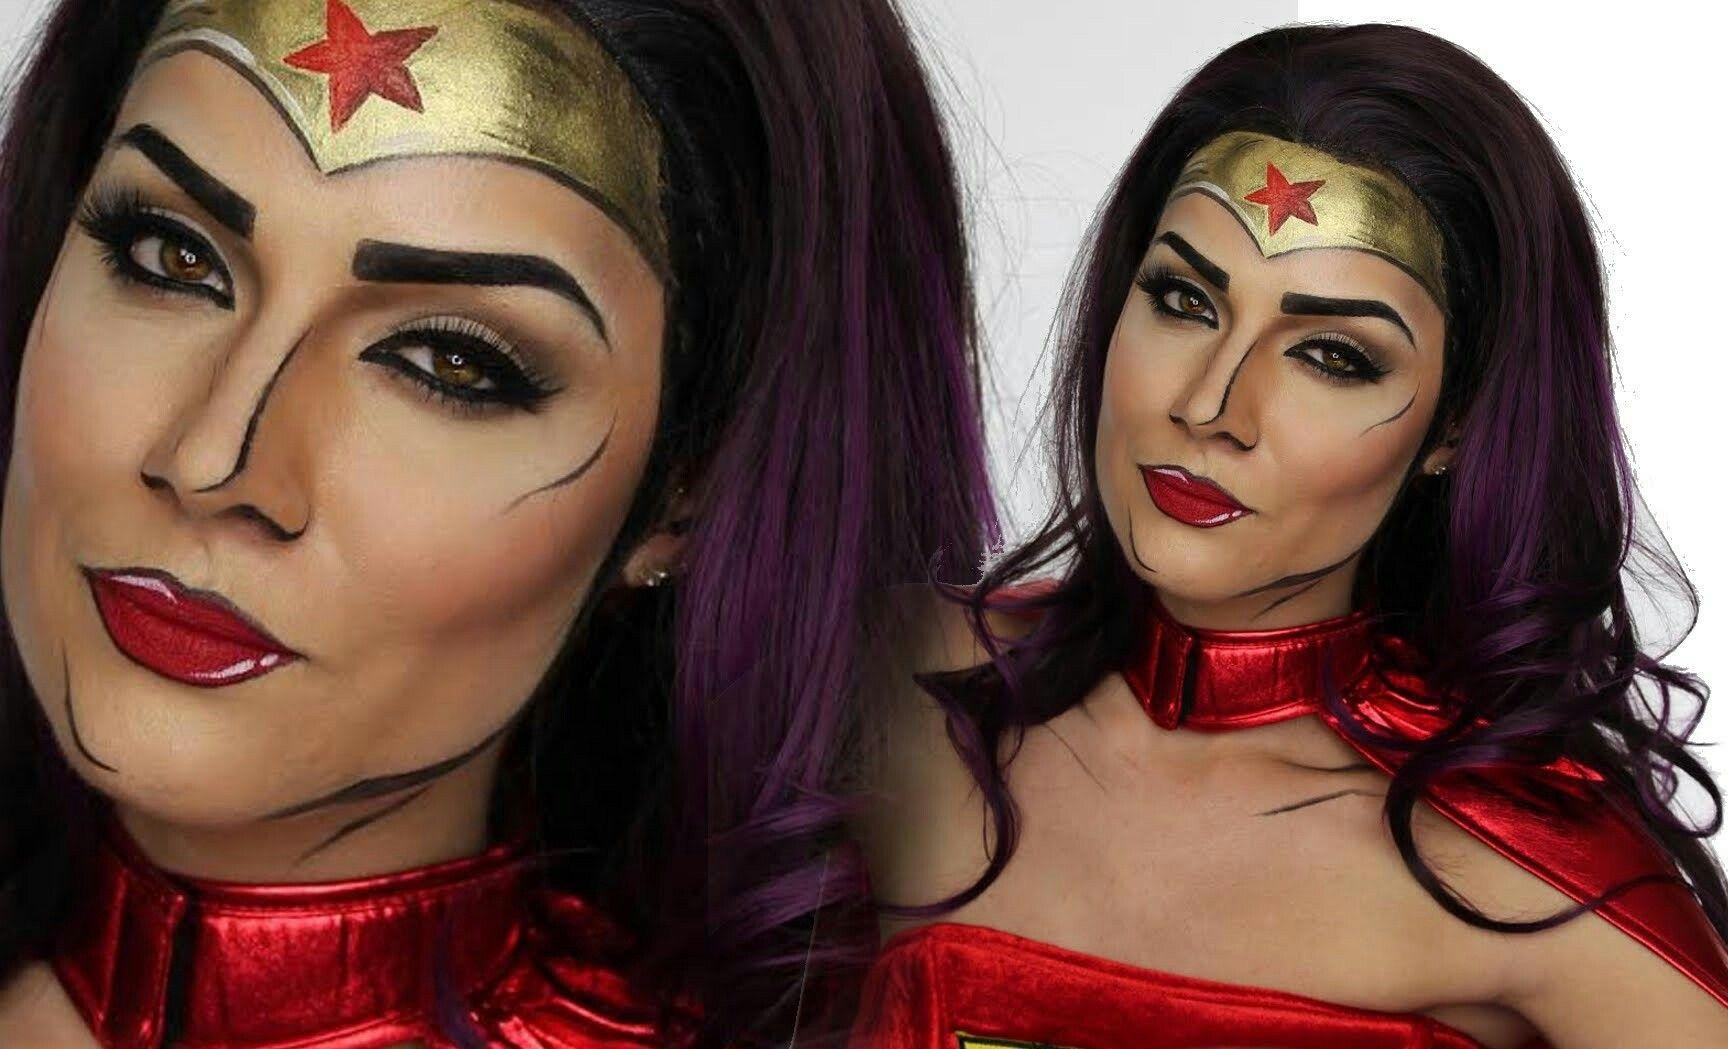 Pin by Jack Lapierre on face paint Wonder woman makeup